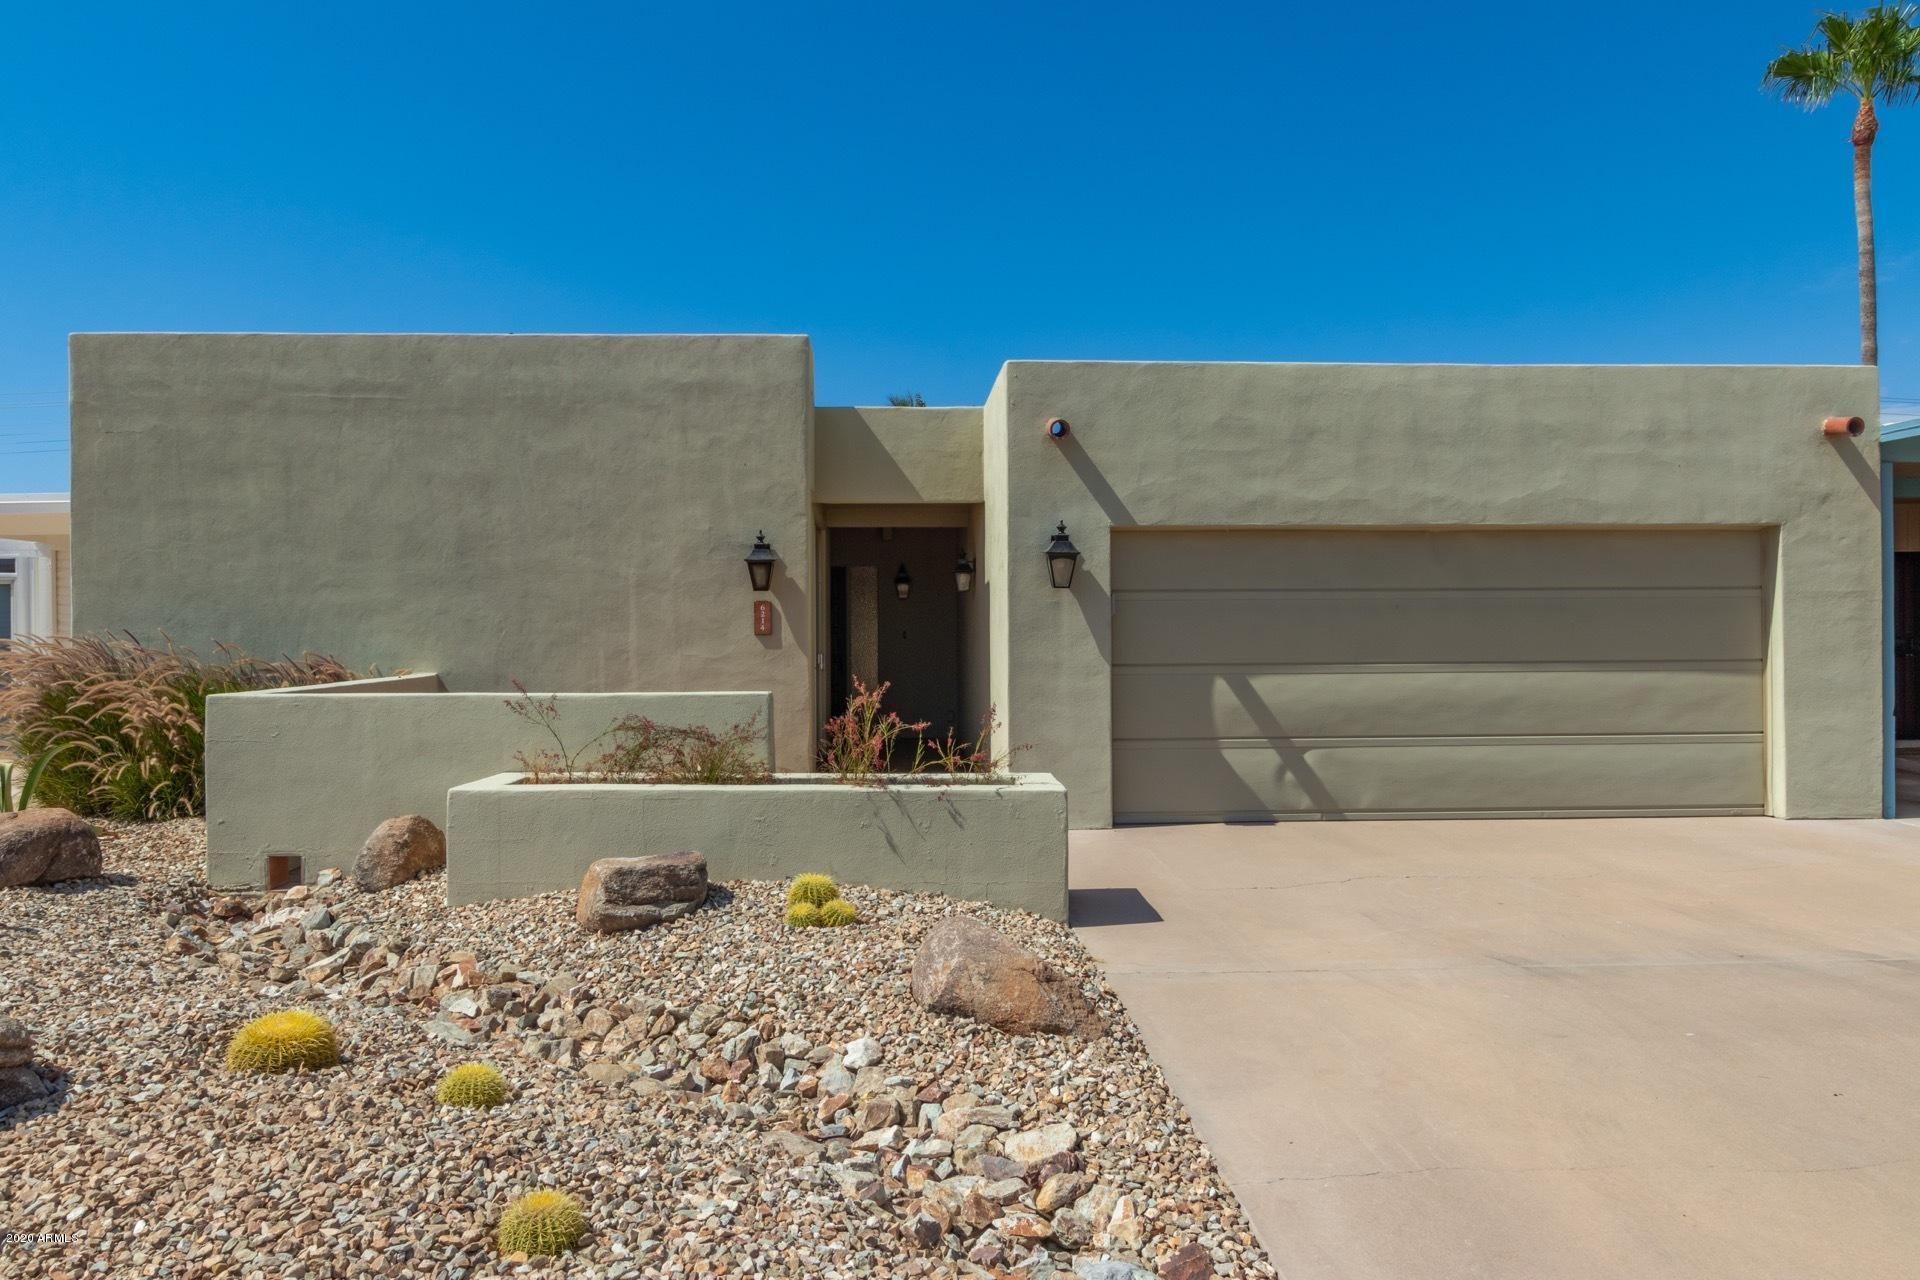 6214 E AVALON Drive, Scottsdale, AZ 85251 - MLS#: 6106388